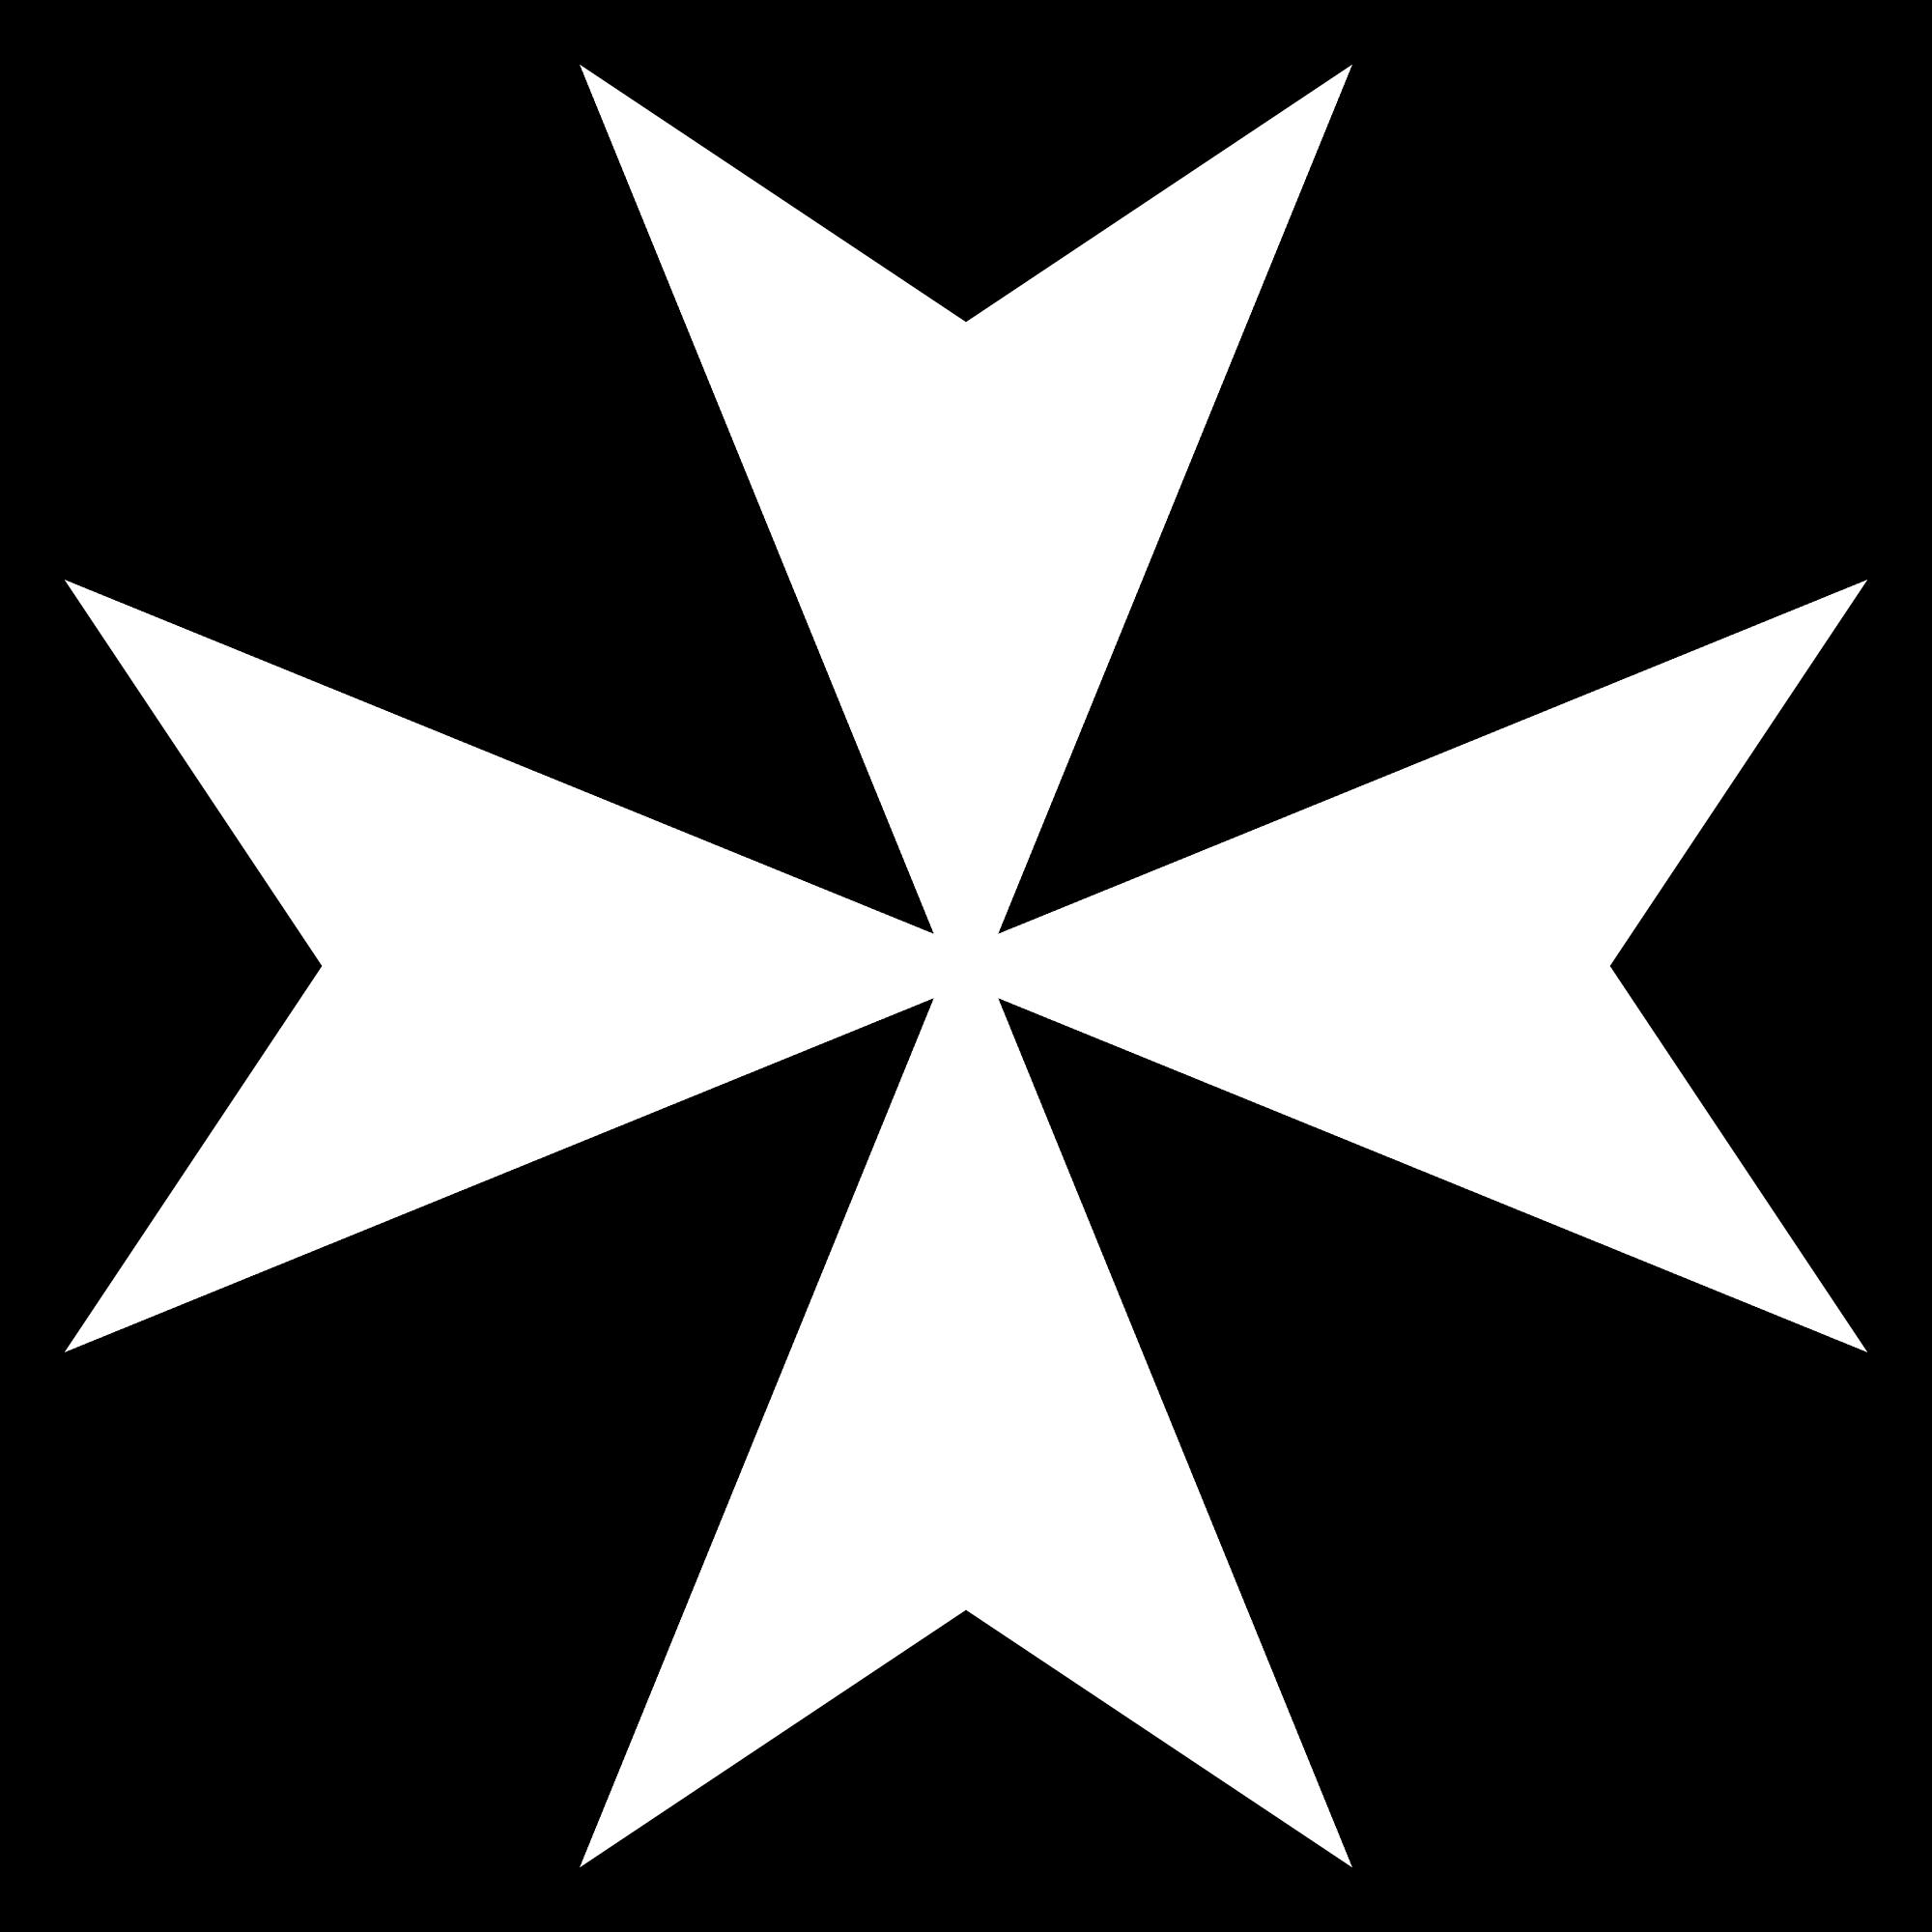 The Maltese Cross: Its origin and importance to Malta.